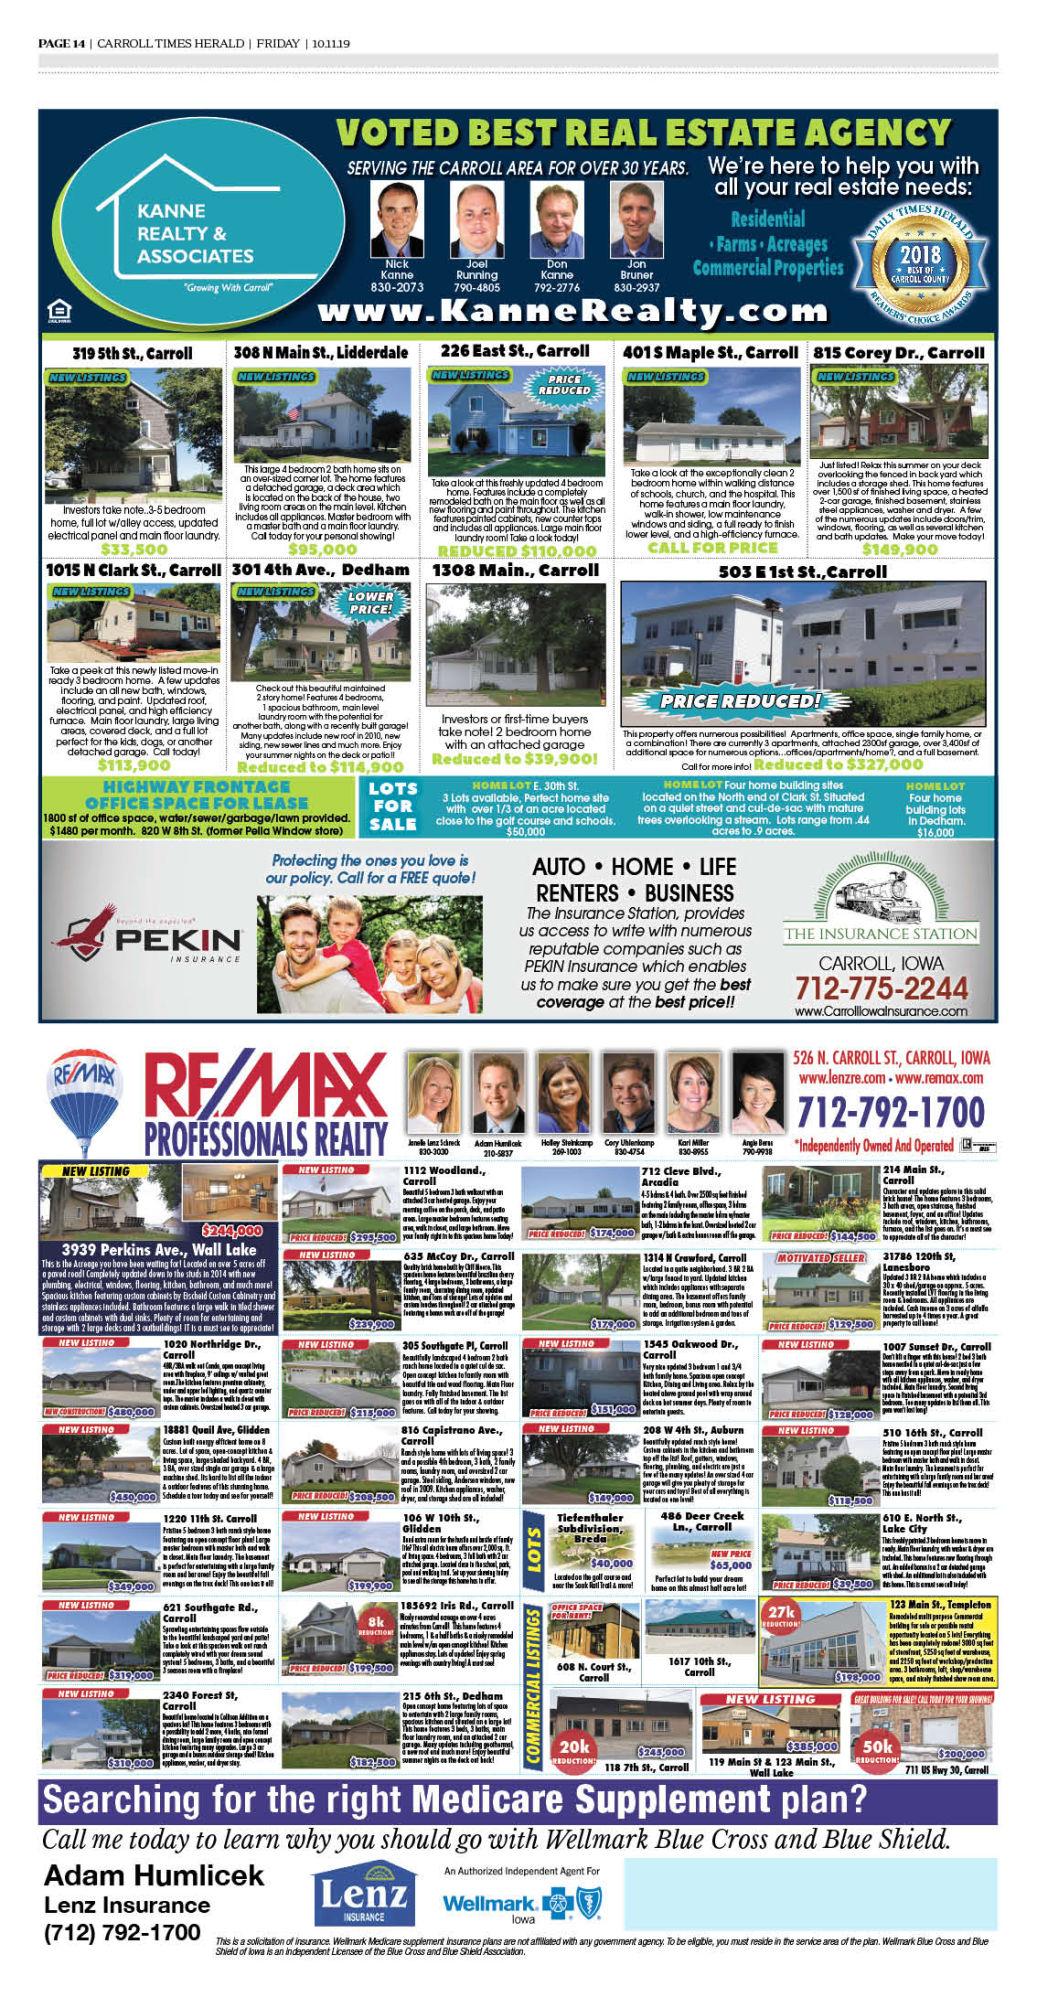 10-11-19 Real Estate 2.jpg